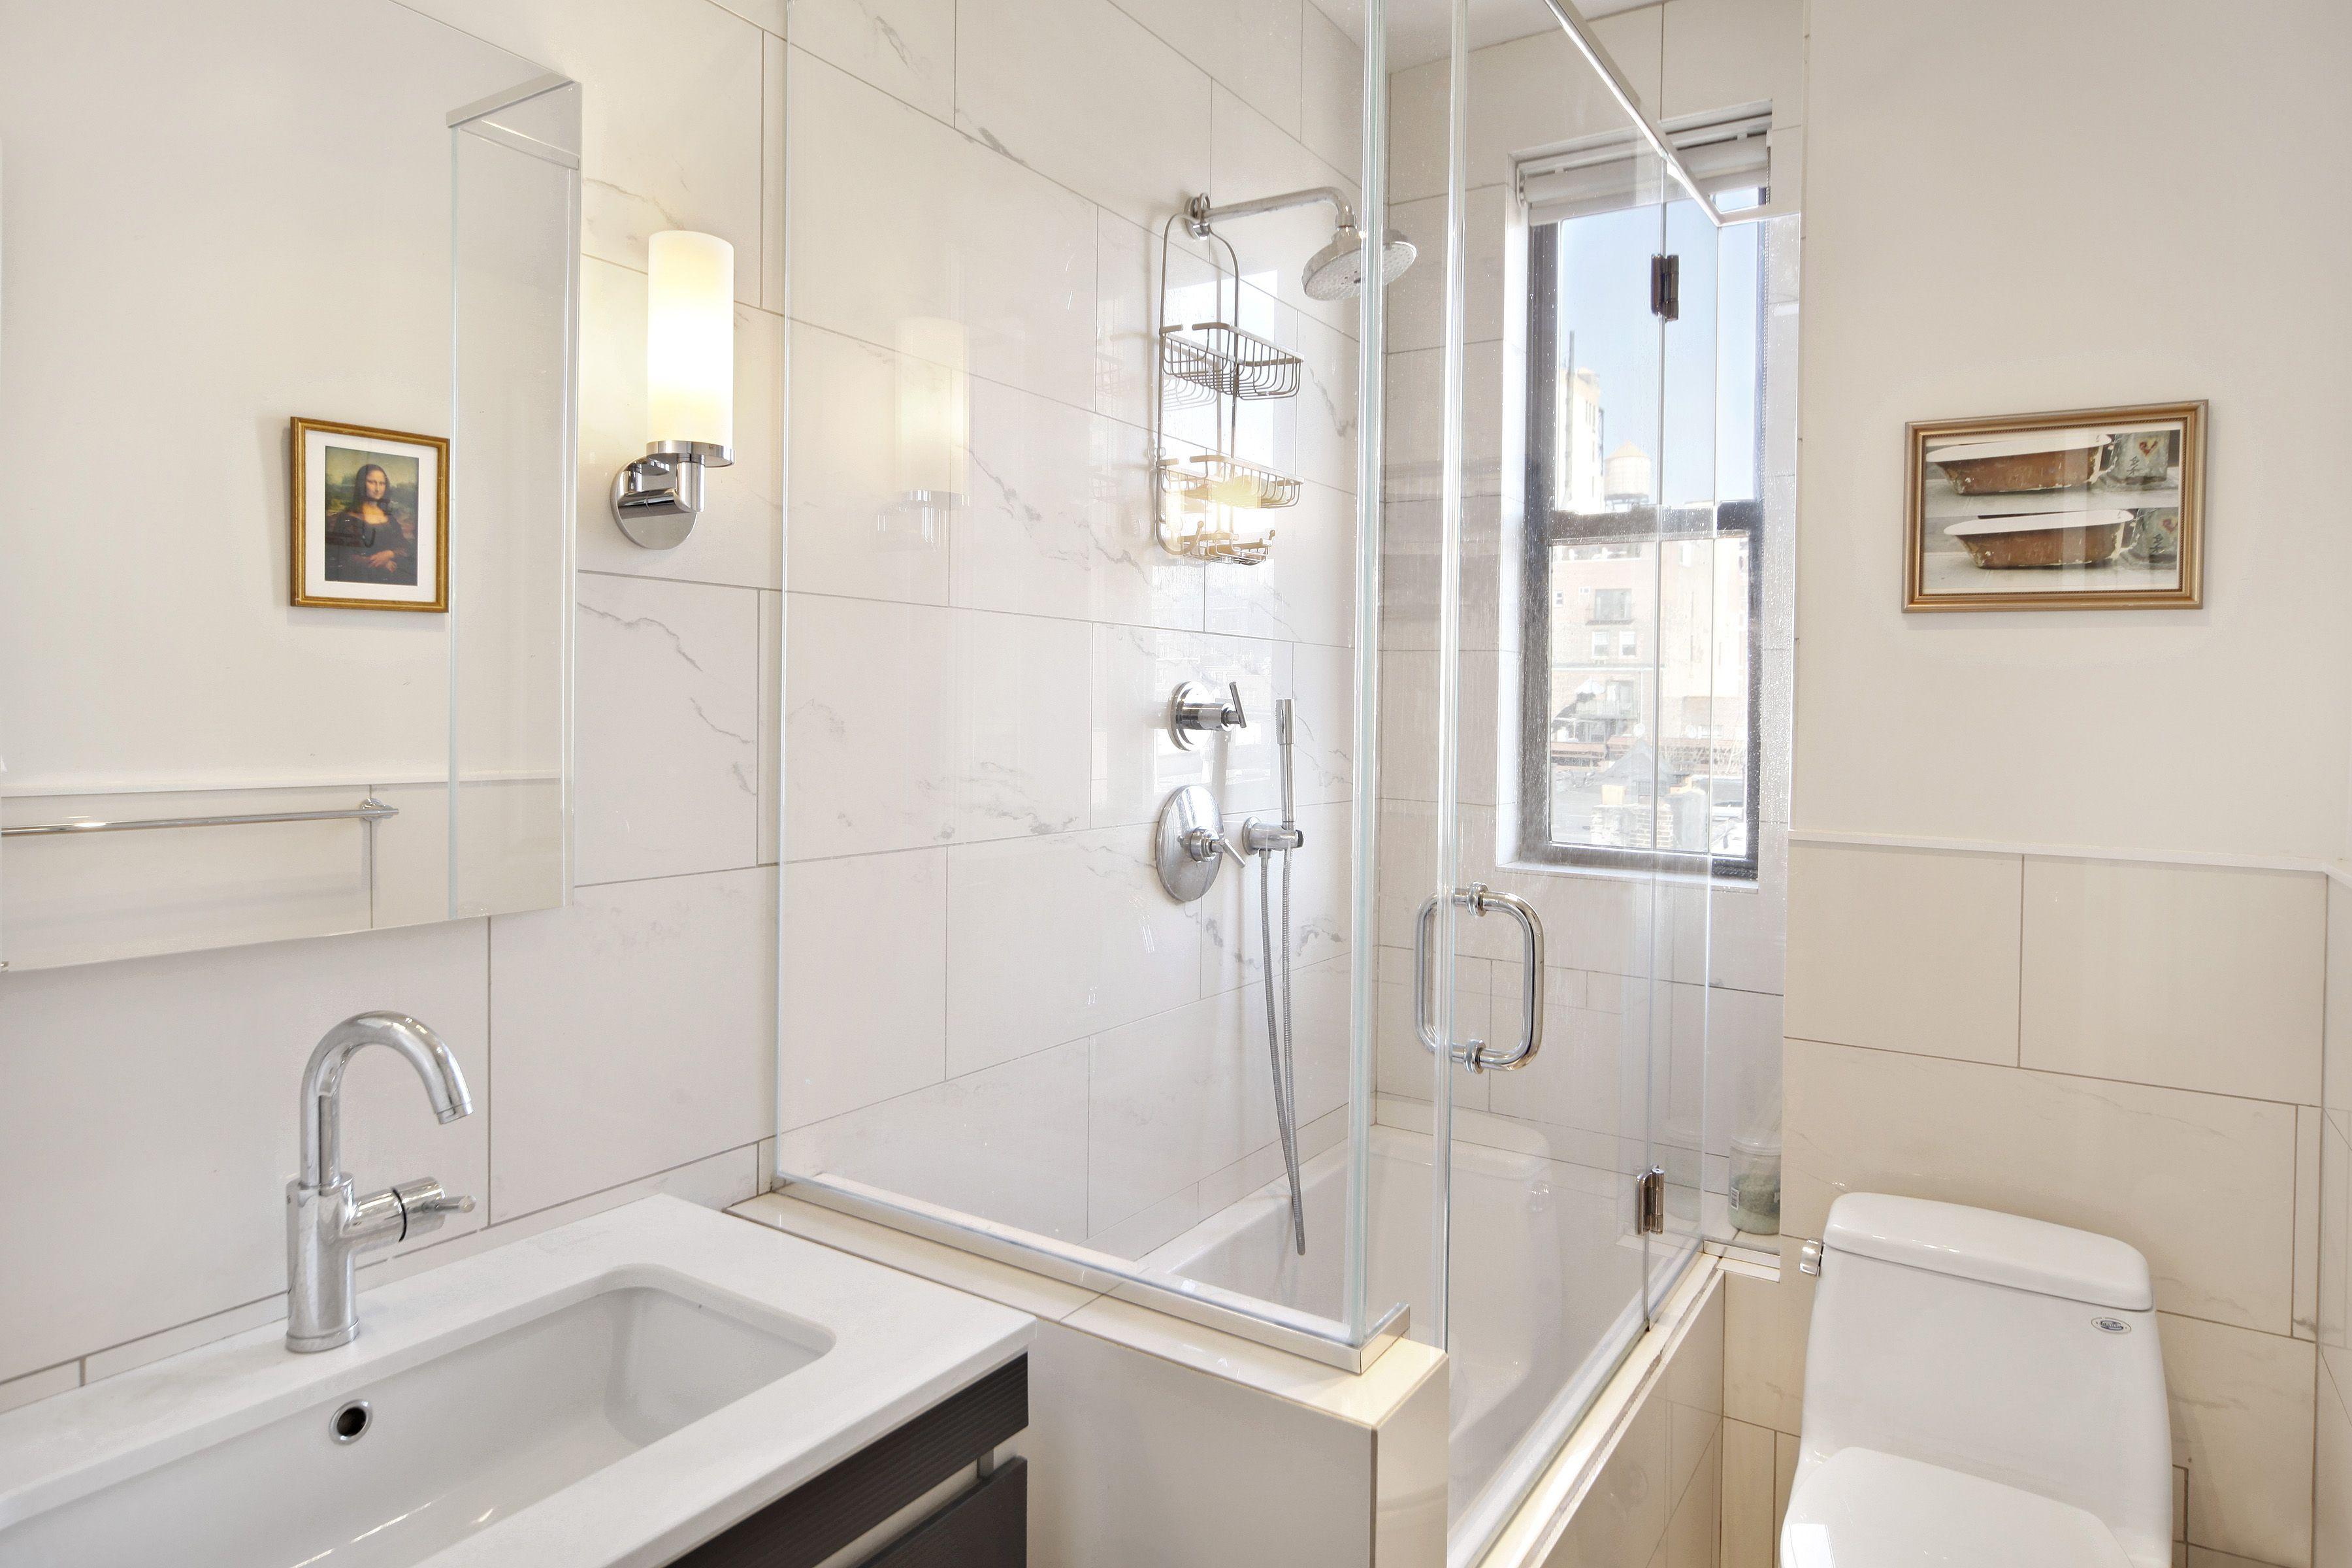 bath/shower options | Bathroom | Pinterest | Bath, Bath shower and ...